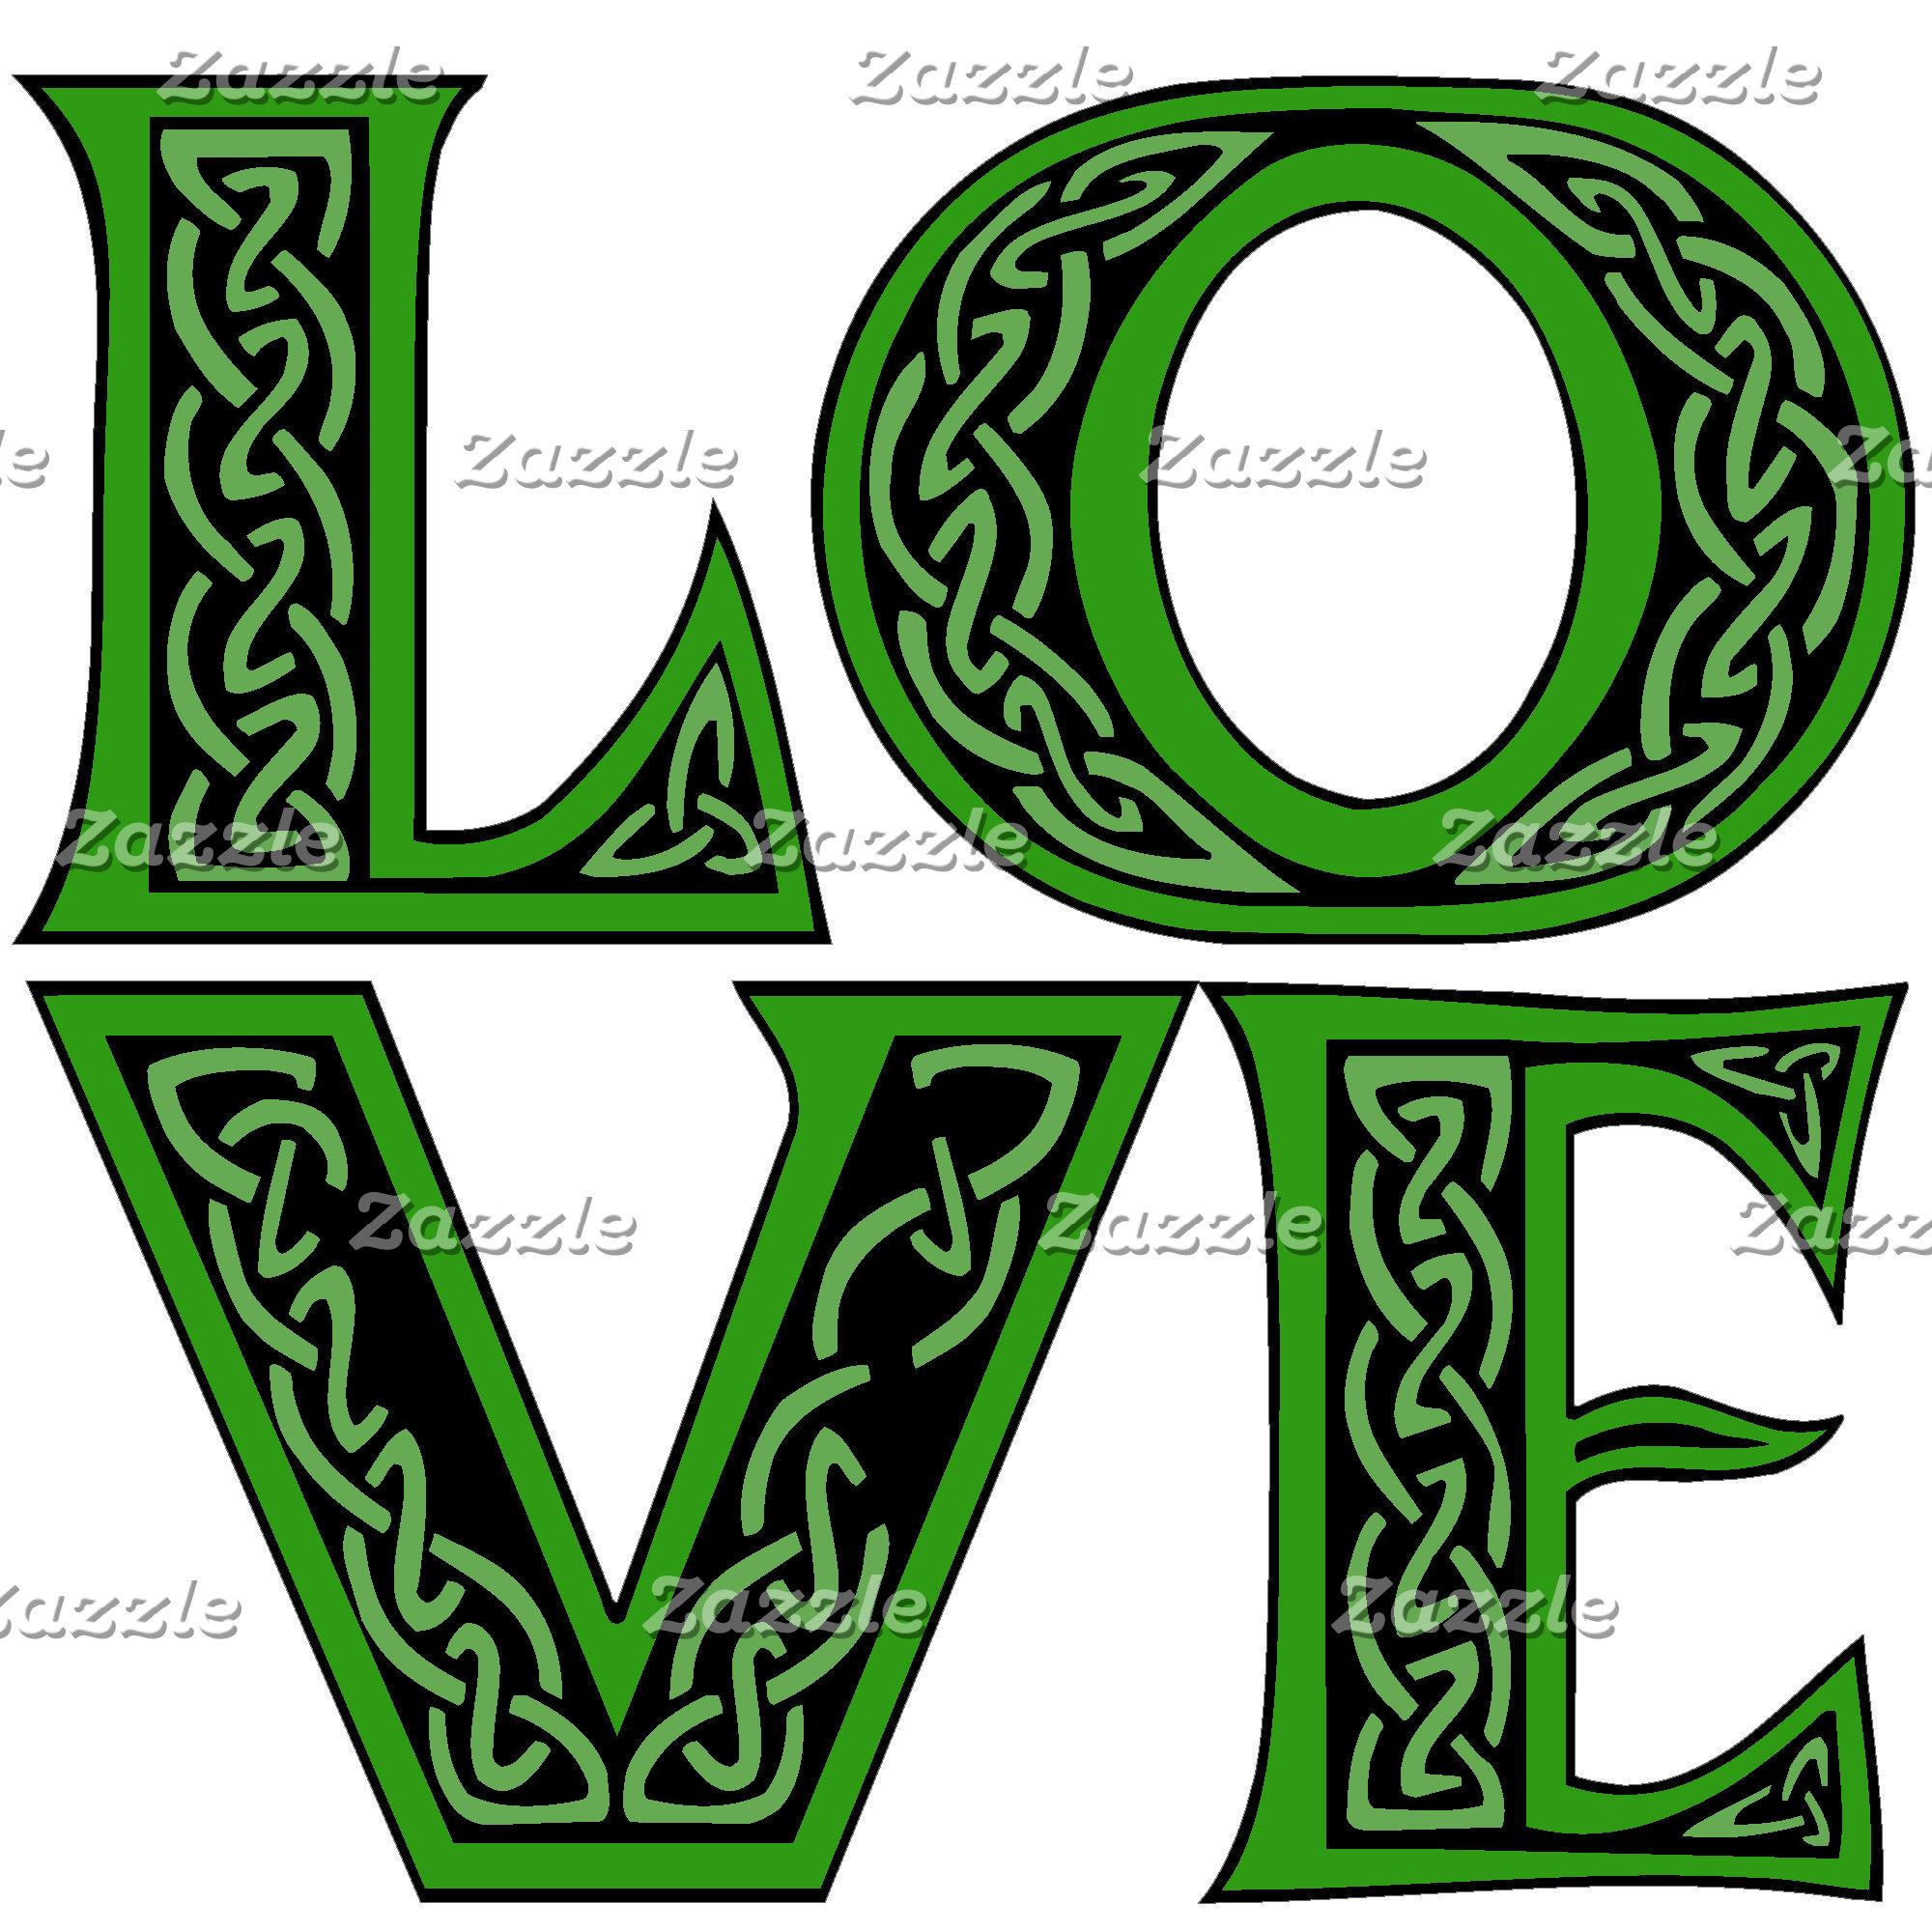 Irish and St. Patrick's Day T-shirts